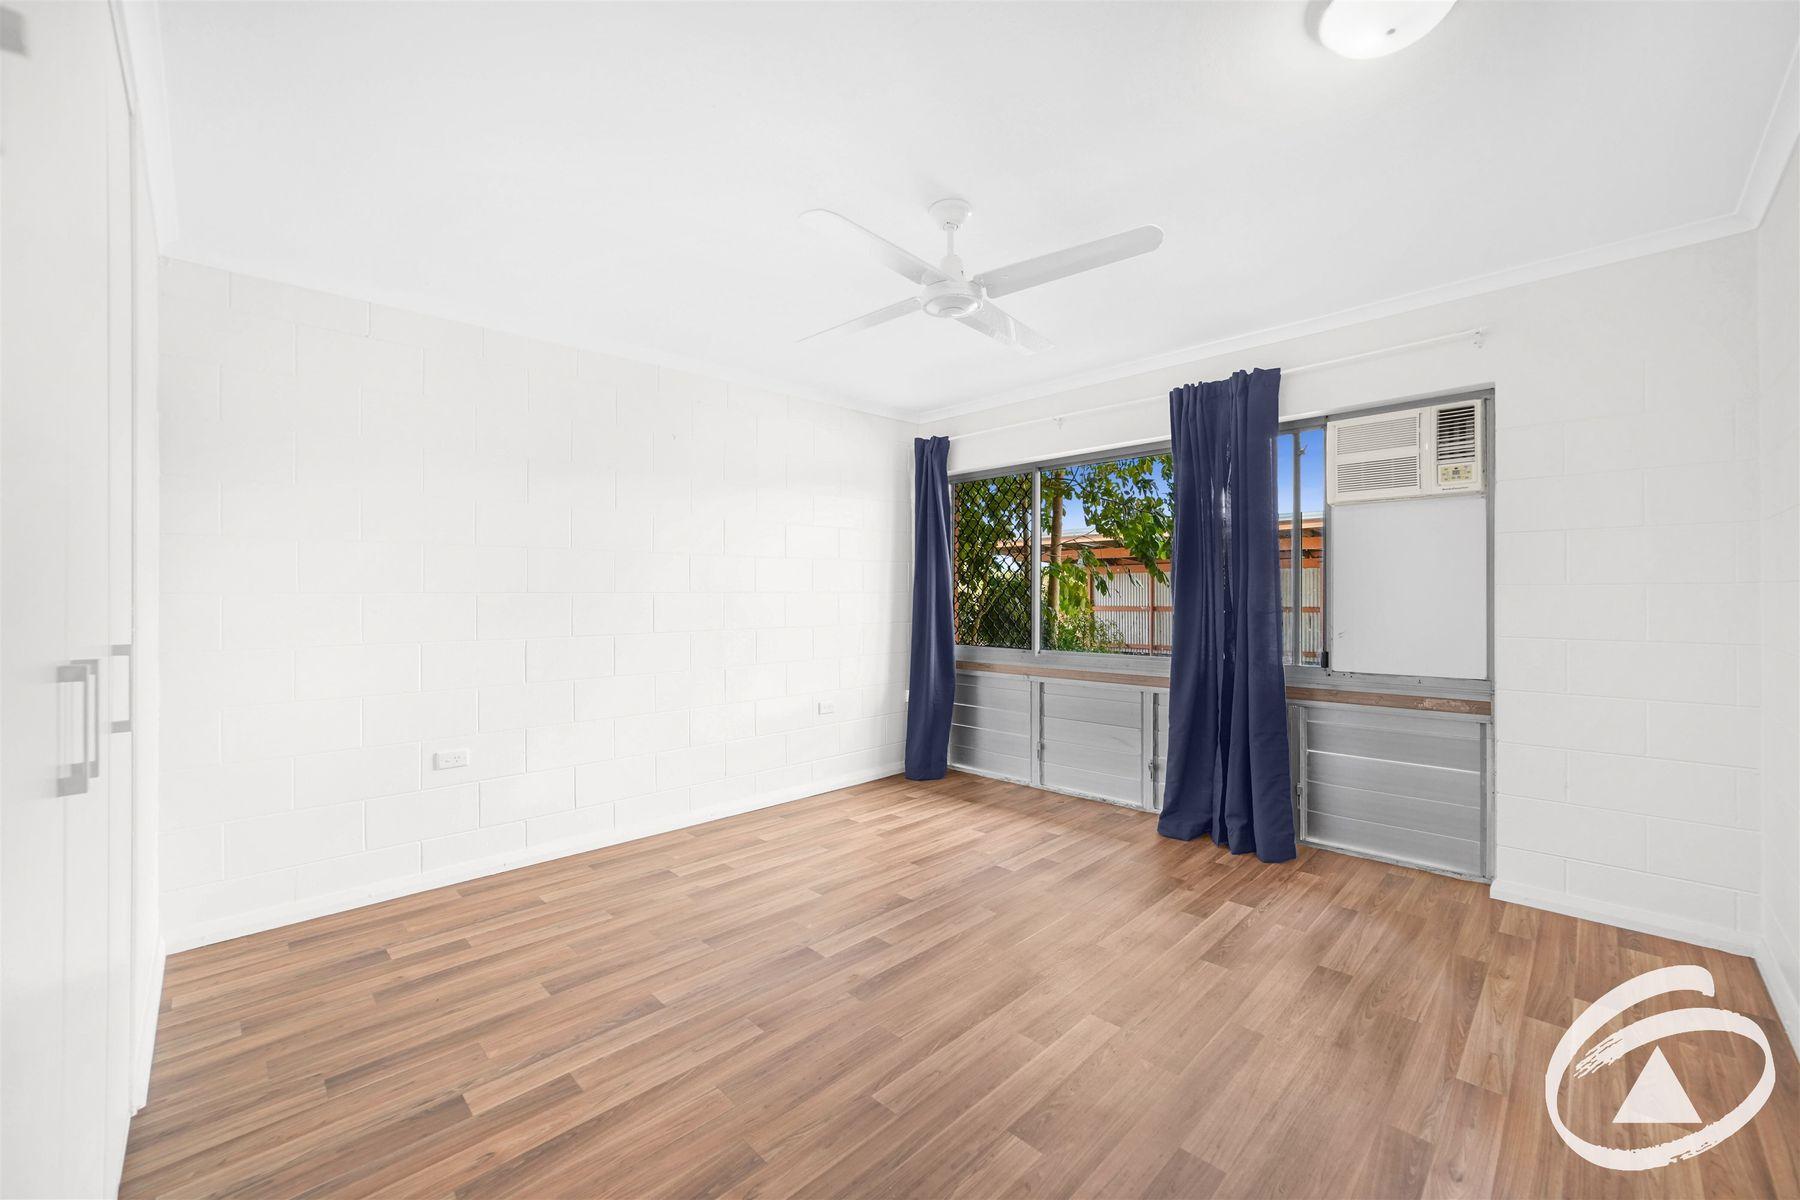 2/40-44 Dalton Street, Westcourt, QLD 4870